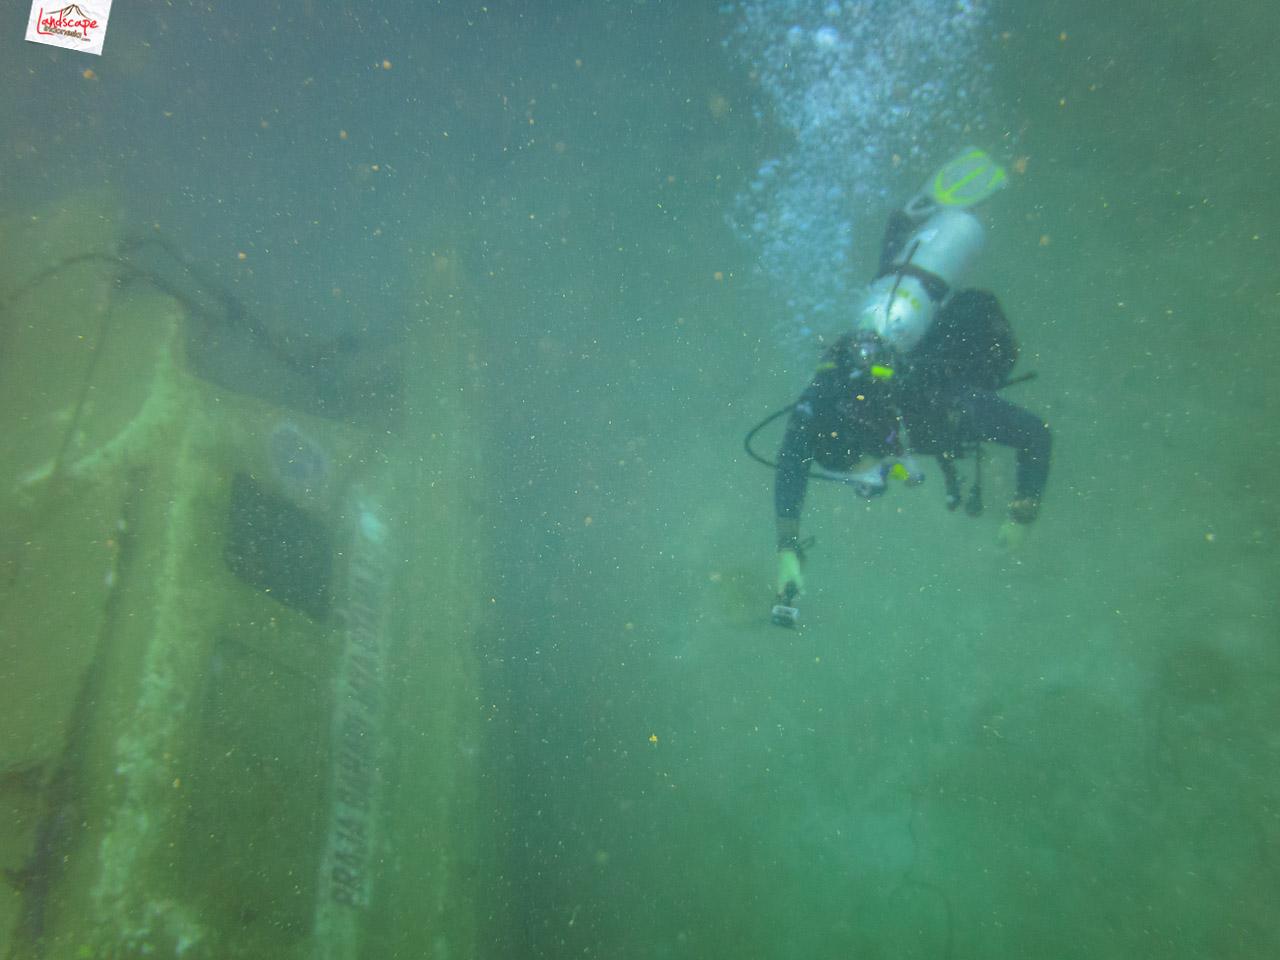 wreck dive kapal ahok 17 - Wreck Dive Kapal Ahok